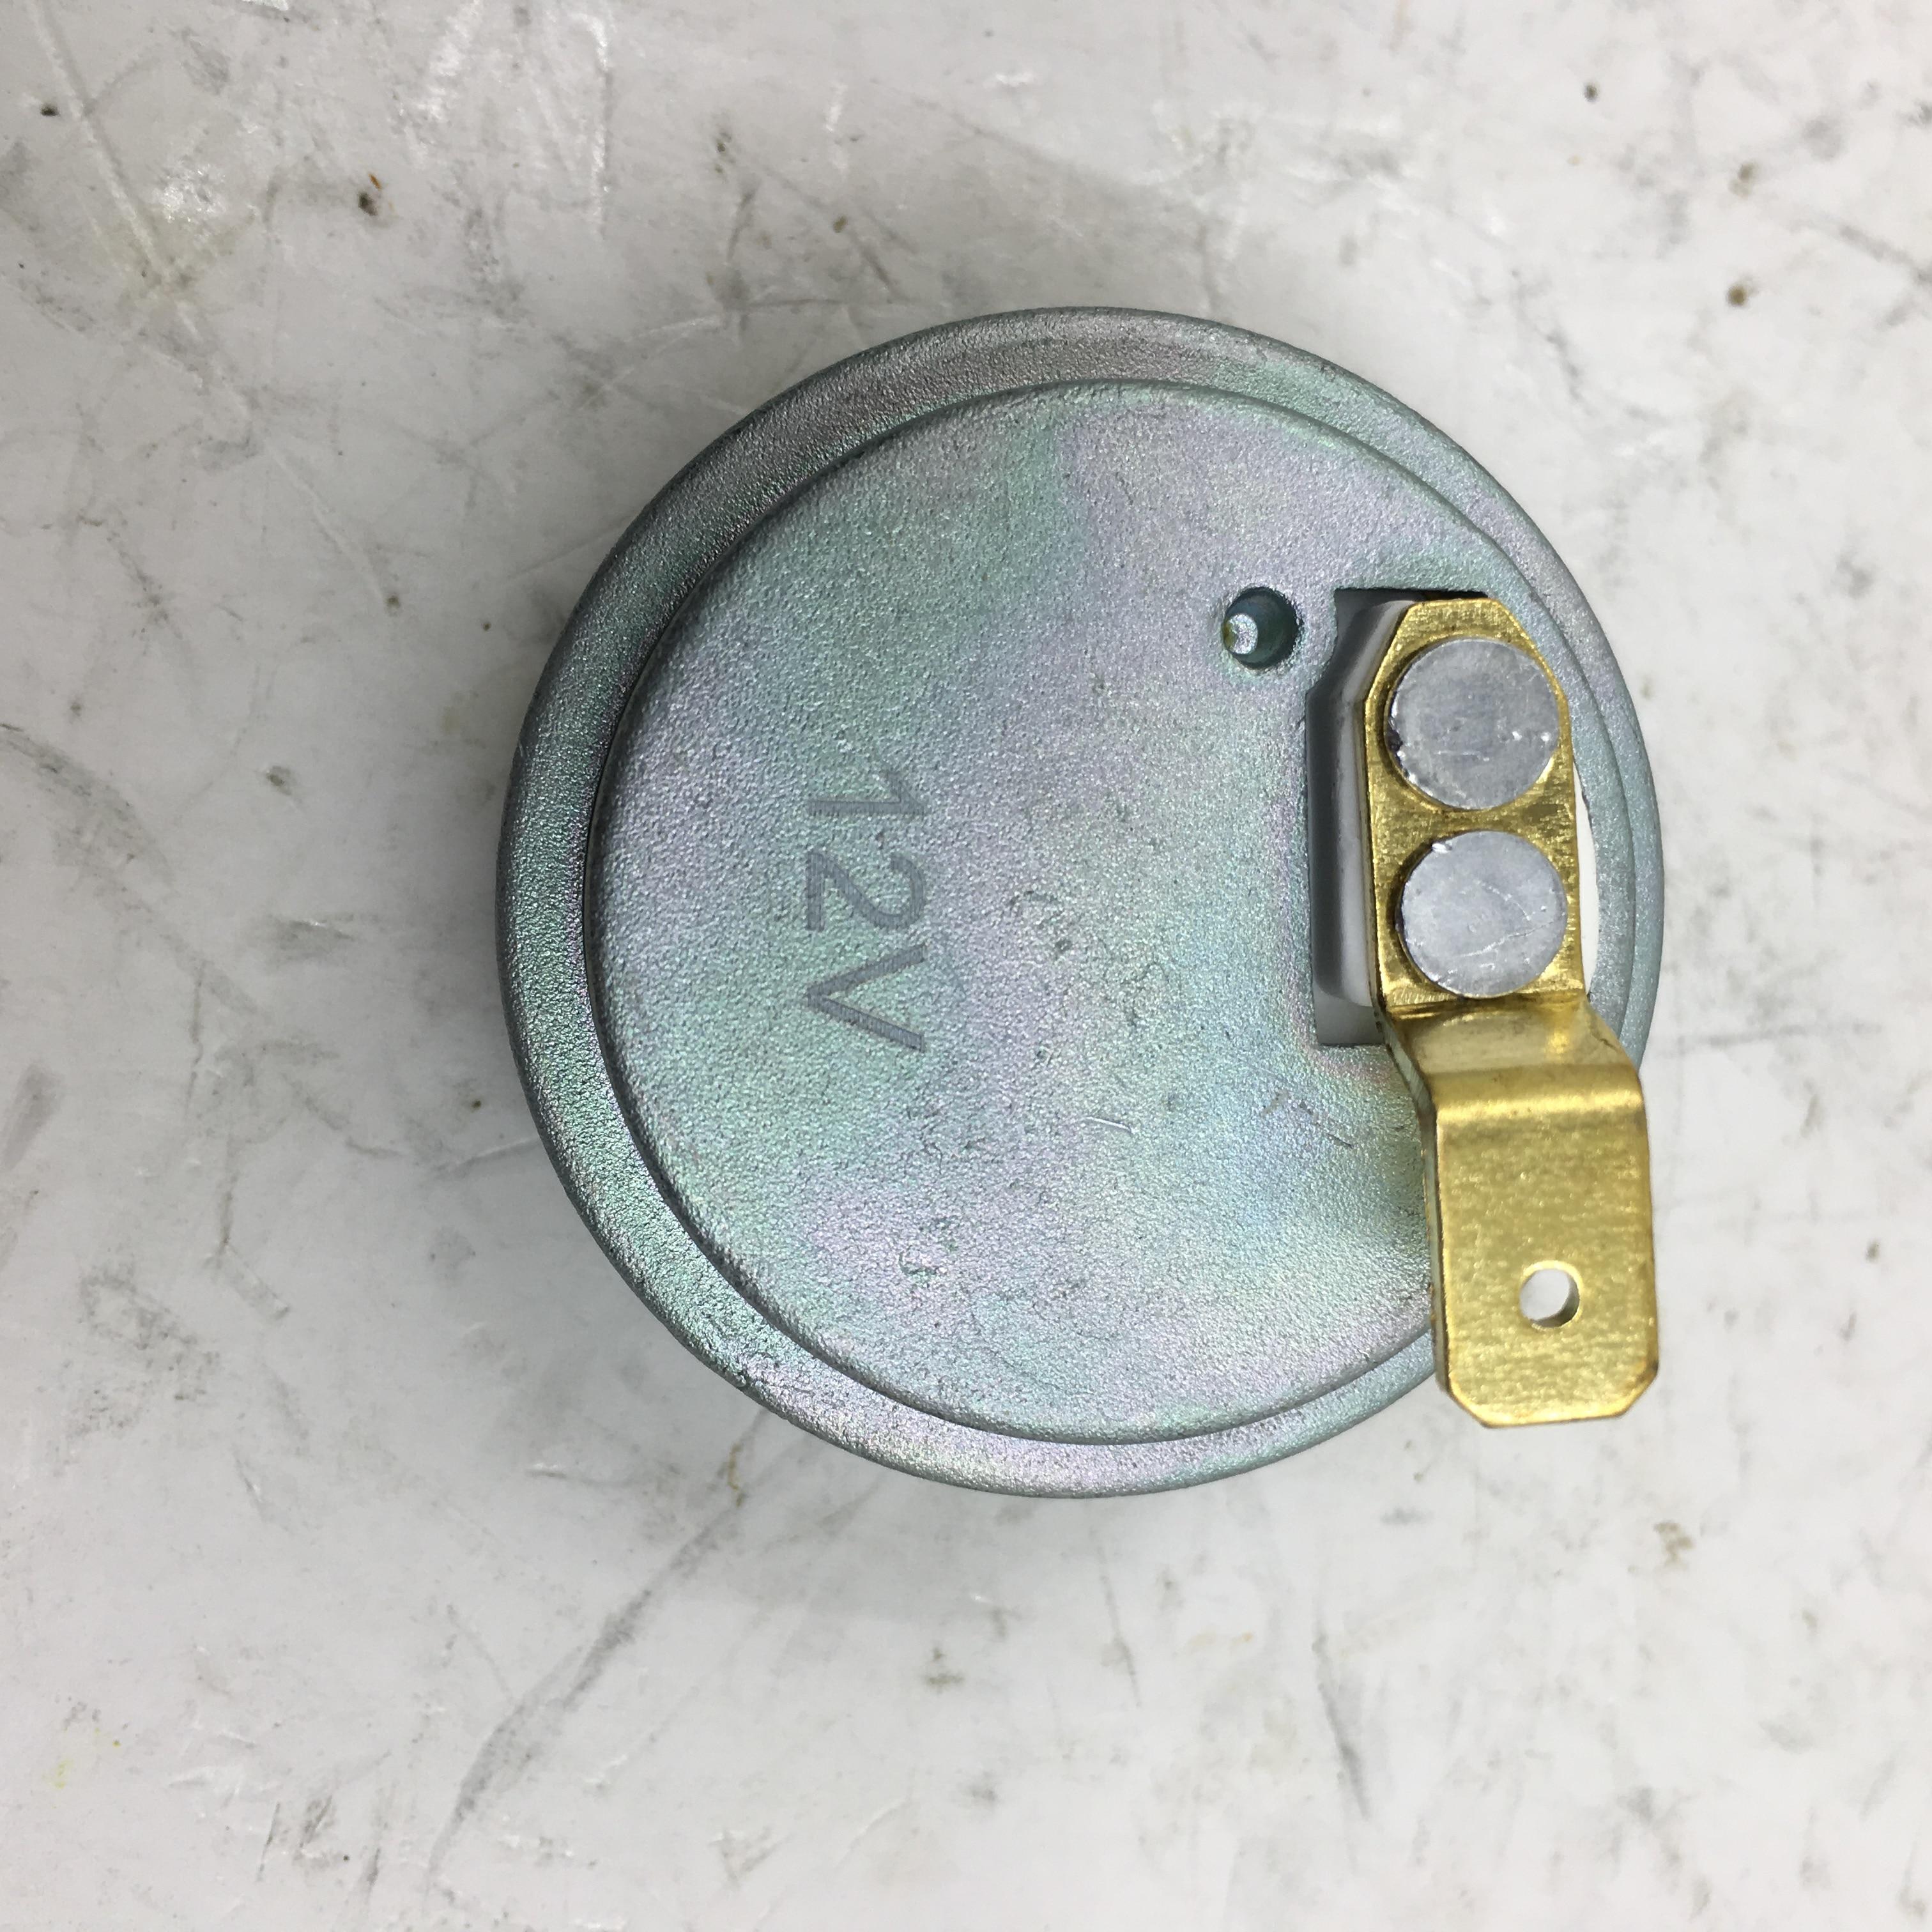 Sherryberg fajs carb 30 pict 30 choke módulo de 12 volts solex elemento de estrangulamento para vw dune buggy 1967-1974 # CPR113129191G-DB